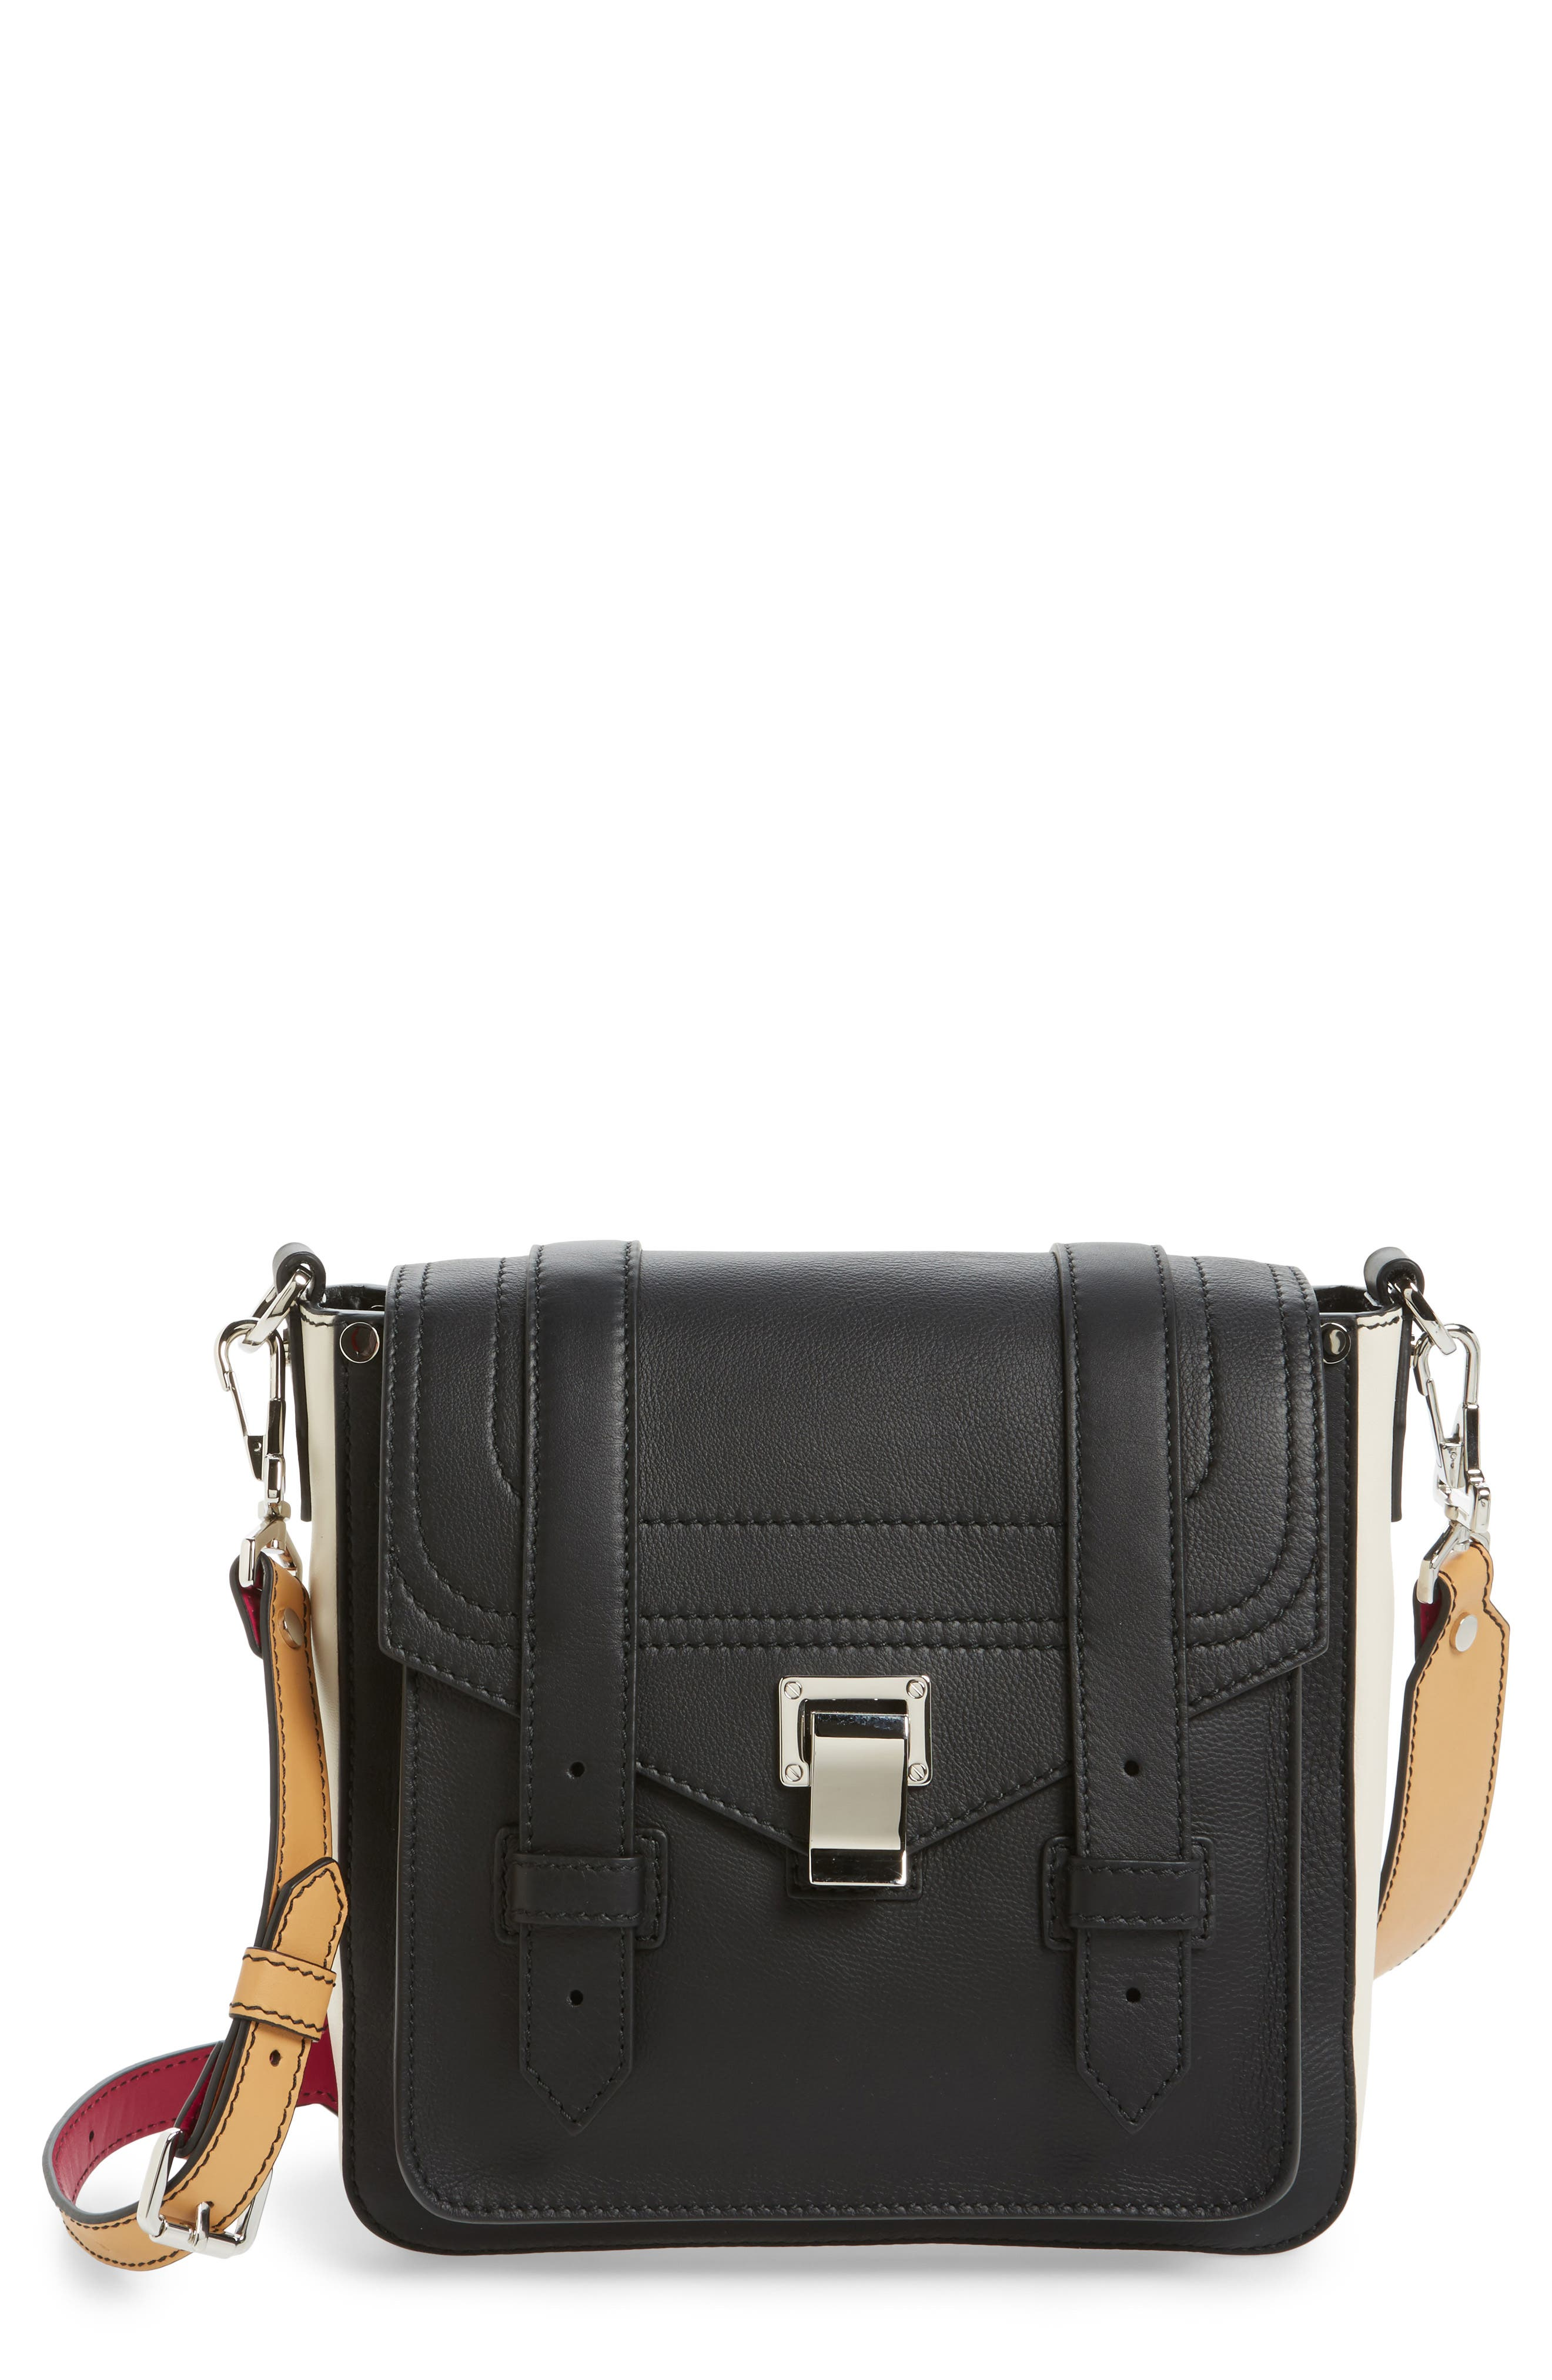 Small PS1 Calfskin Hobo,                         Main,                         color, Black/ Clay